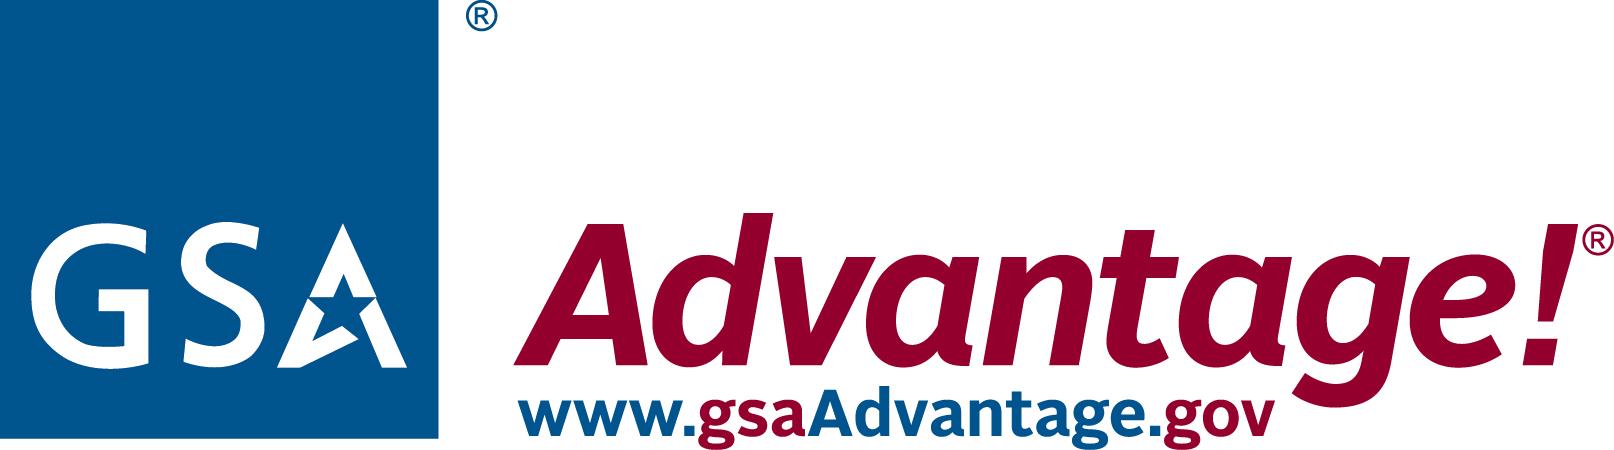 gsaadvantage-full-color-with-url-2015.jpg